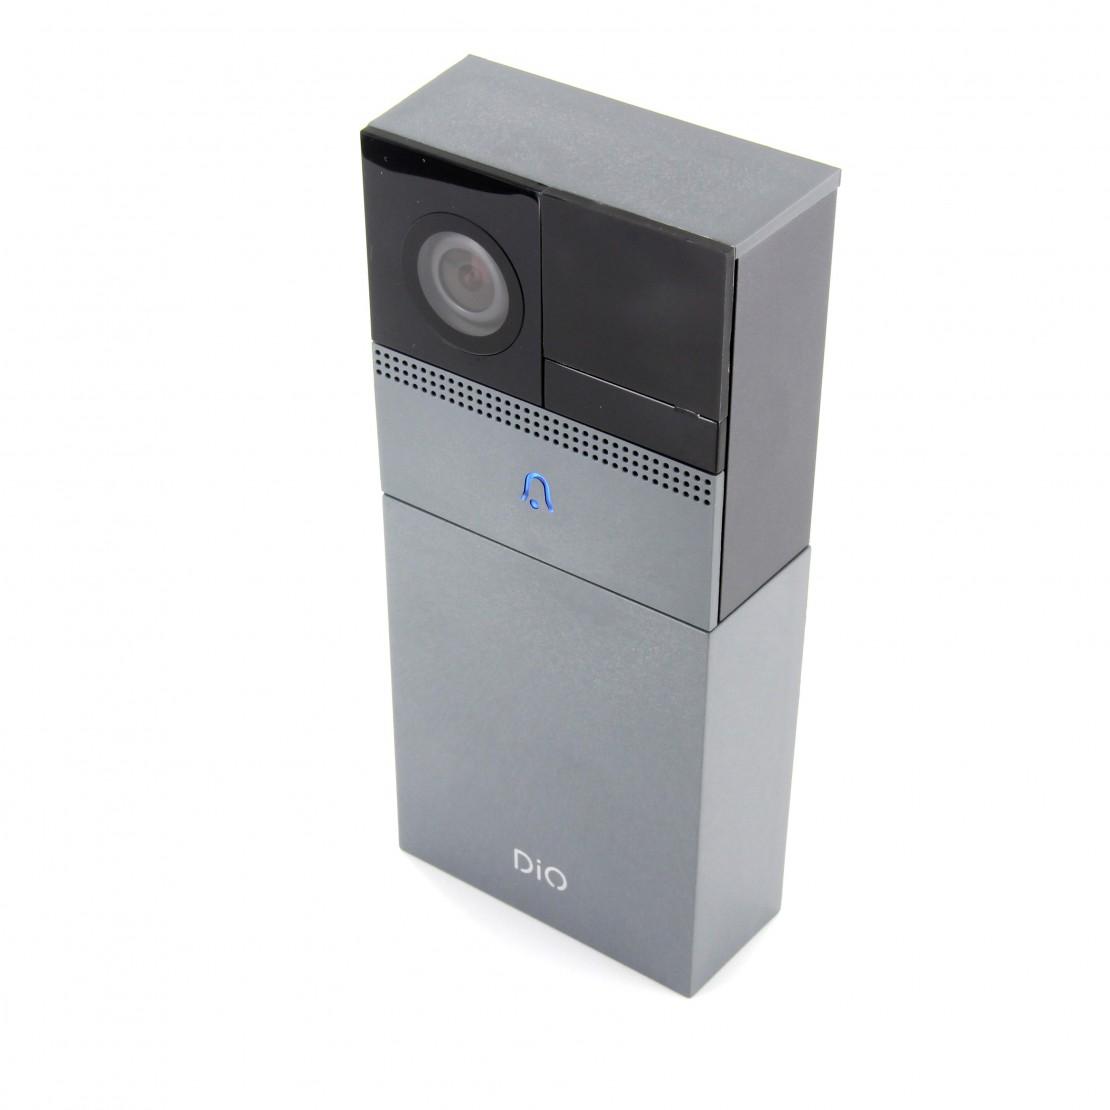 Wi-Fi DiO videophone 100% wireless